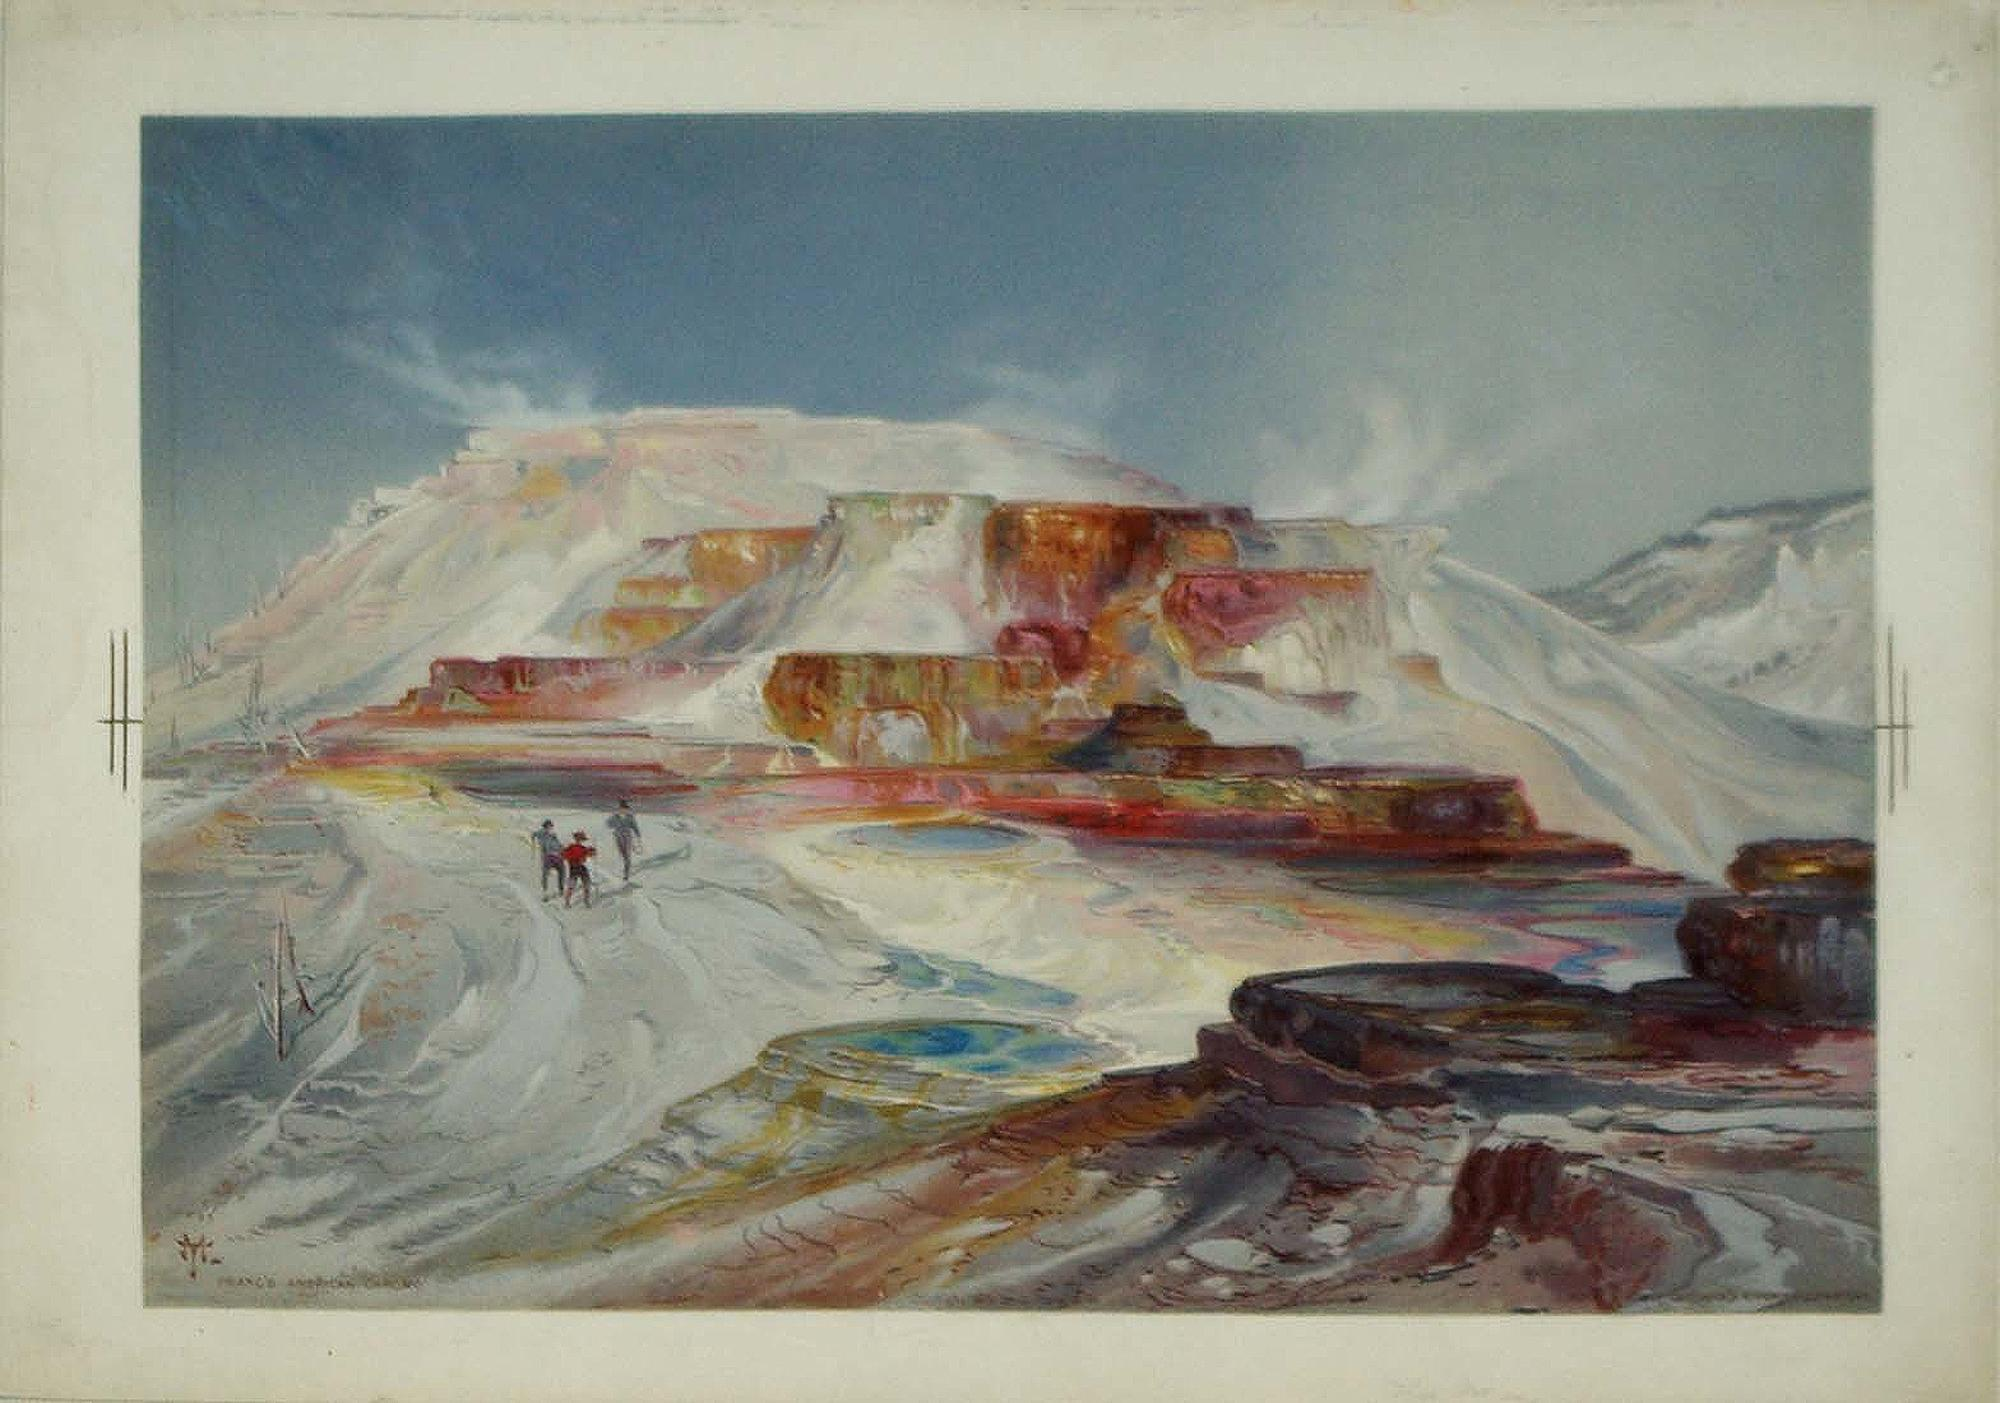 Hot spring of Gardiner¿s River, Yellowstone: Thomas Moran (1837-1926)